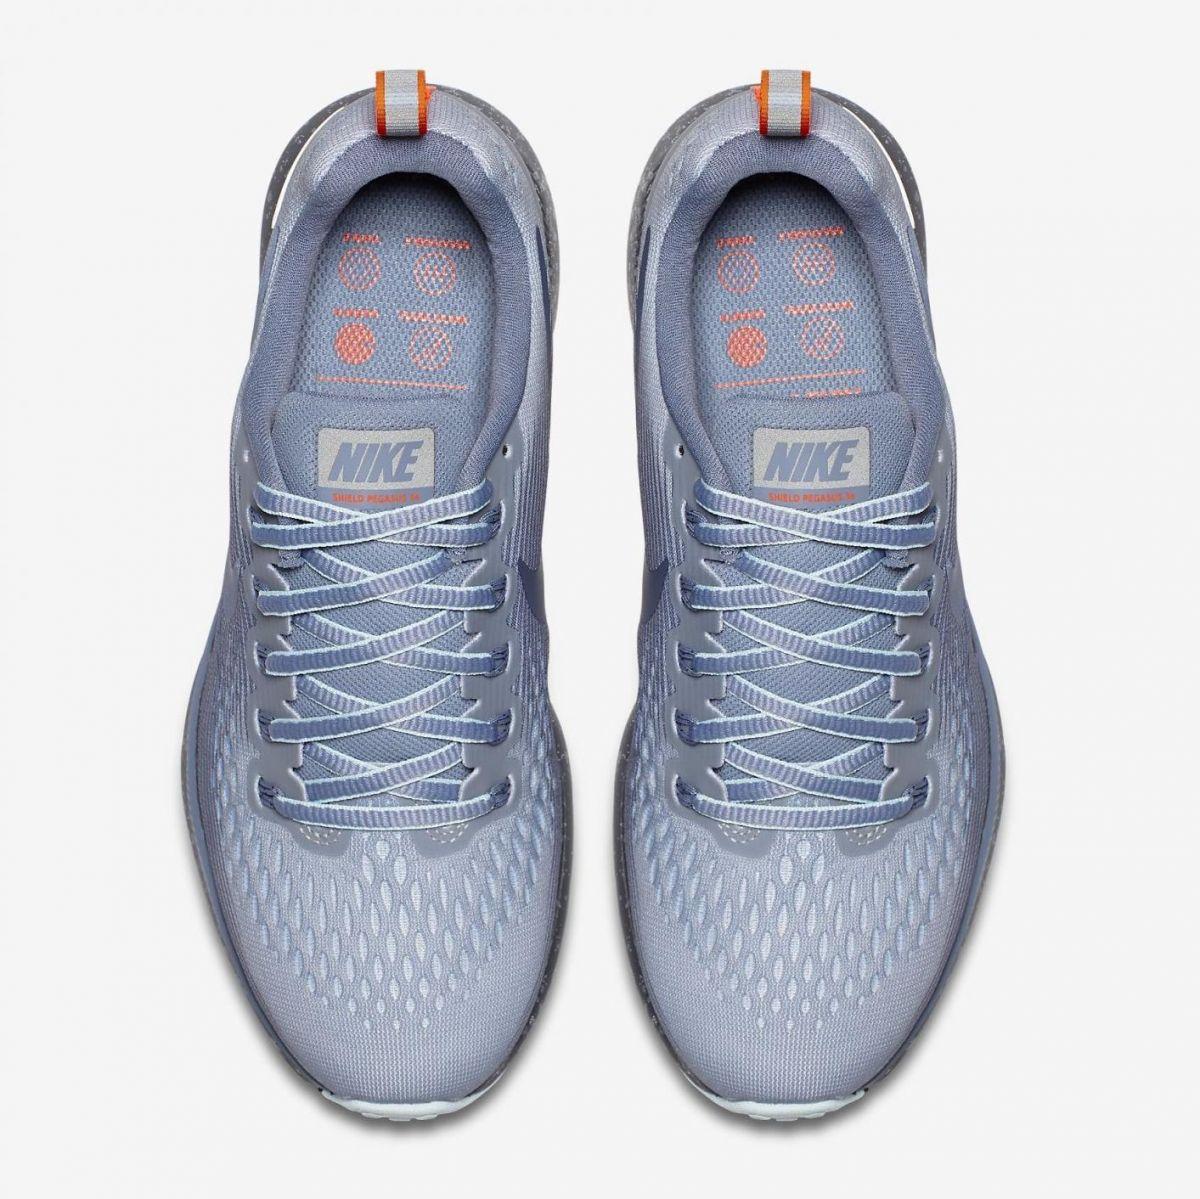 differently 11993 761da Nike Air Zoom Pegasus 34 Shield Damen Laufschuhe Running grau. 1 2 3 4  5 6